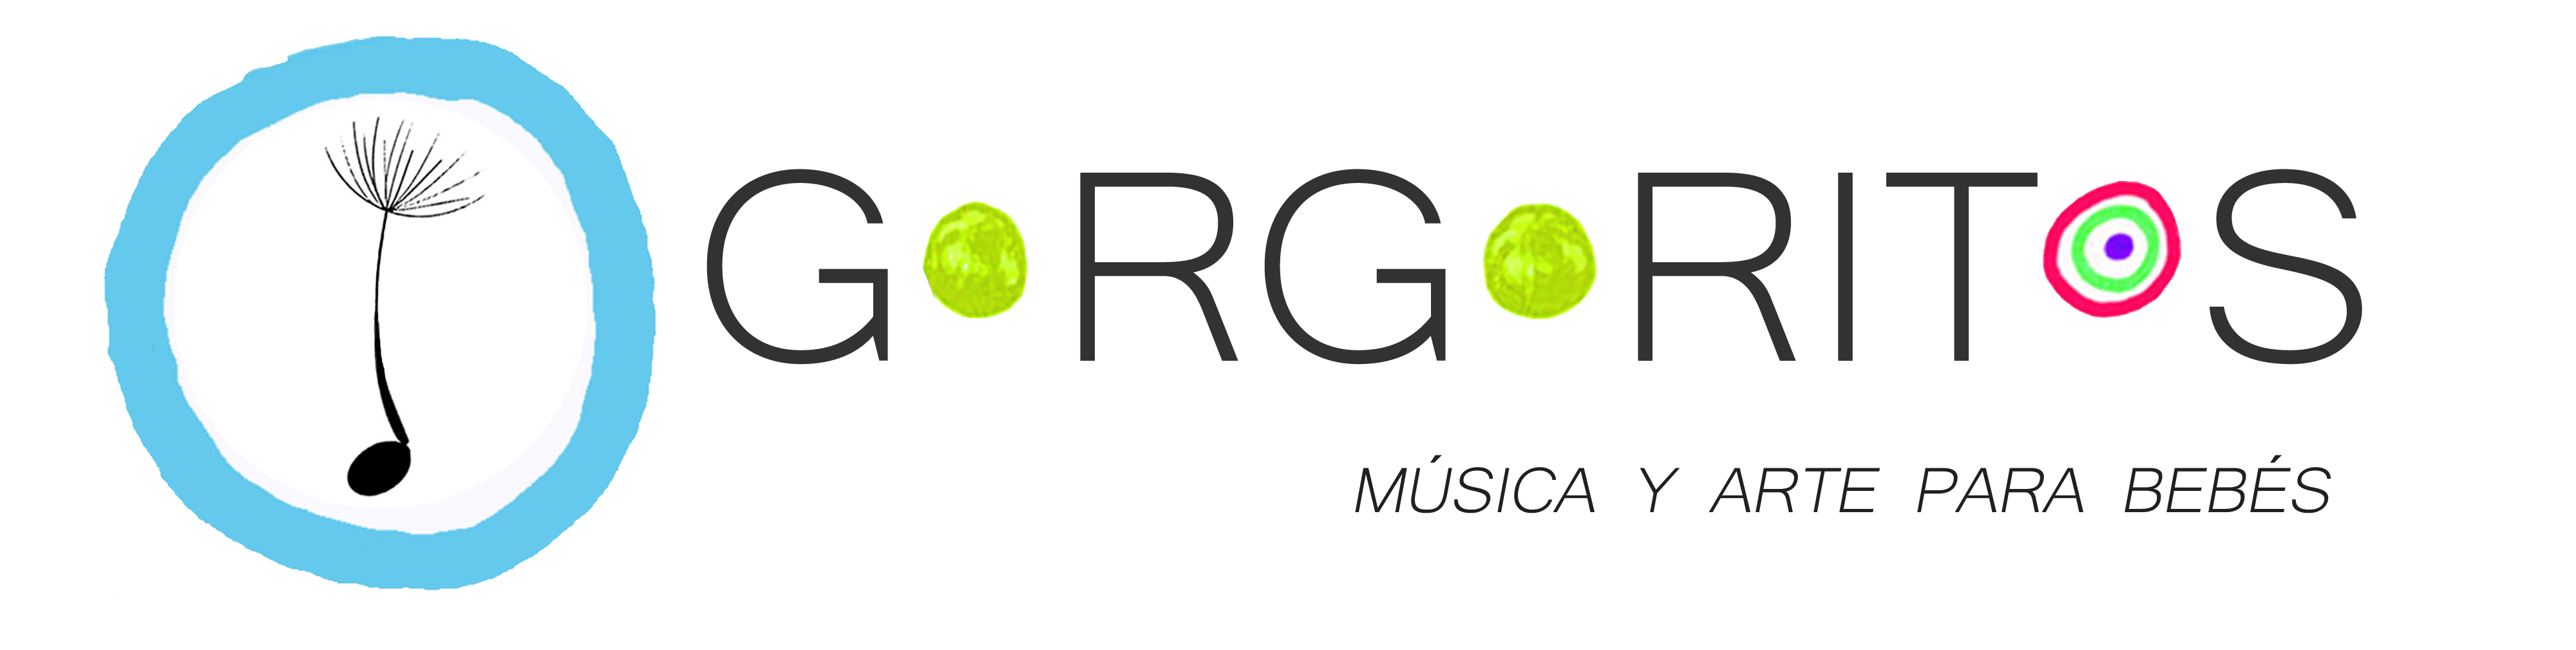 cropped-logo-gorgo1.png